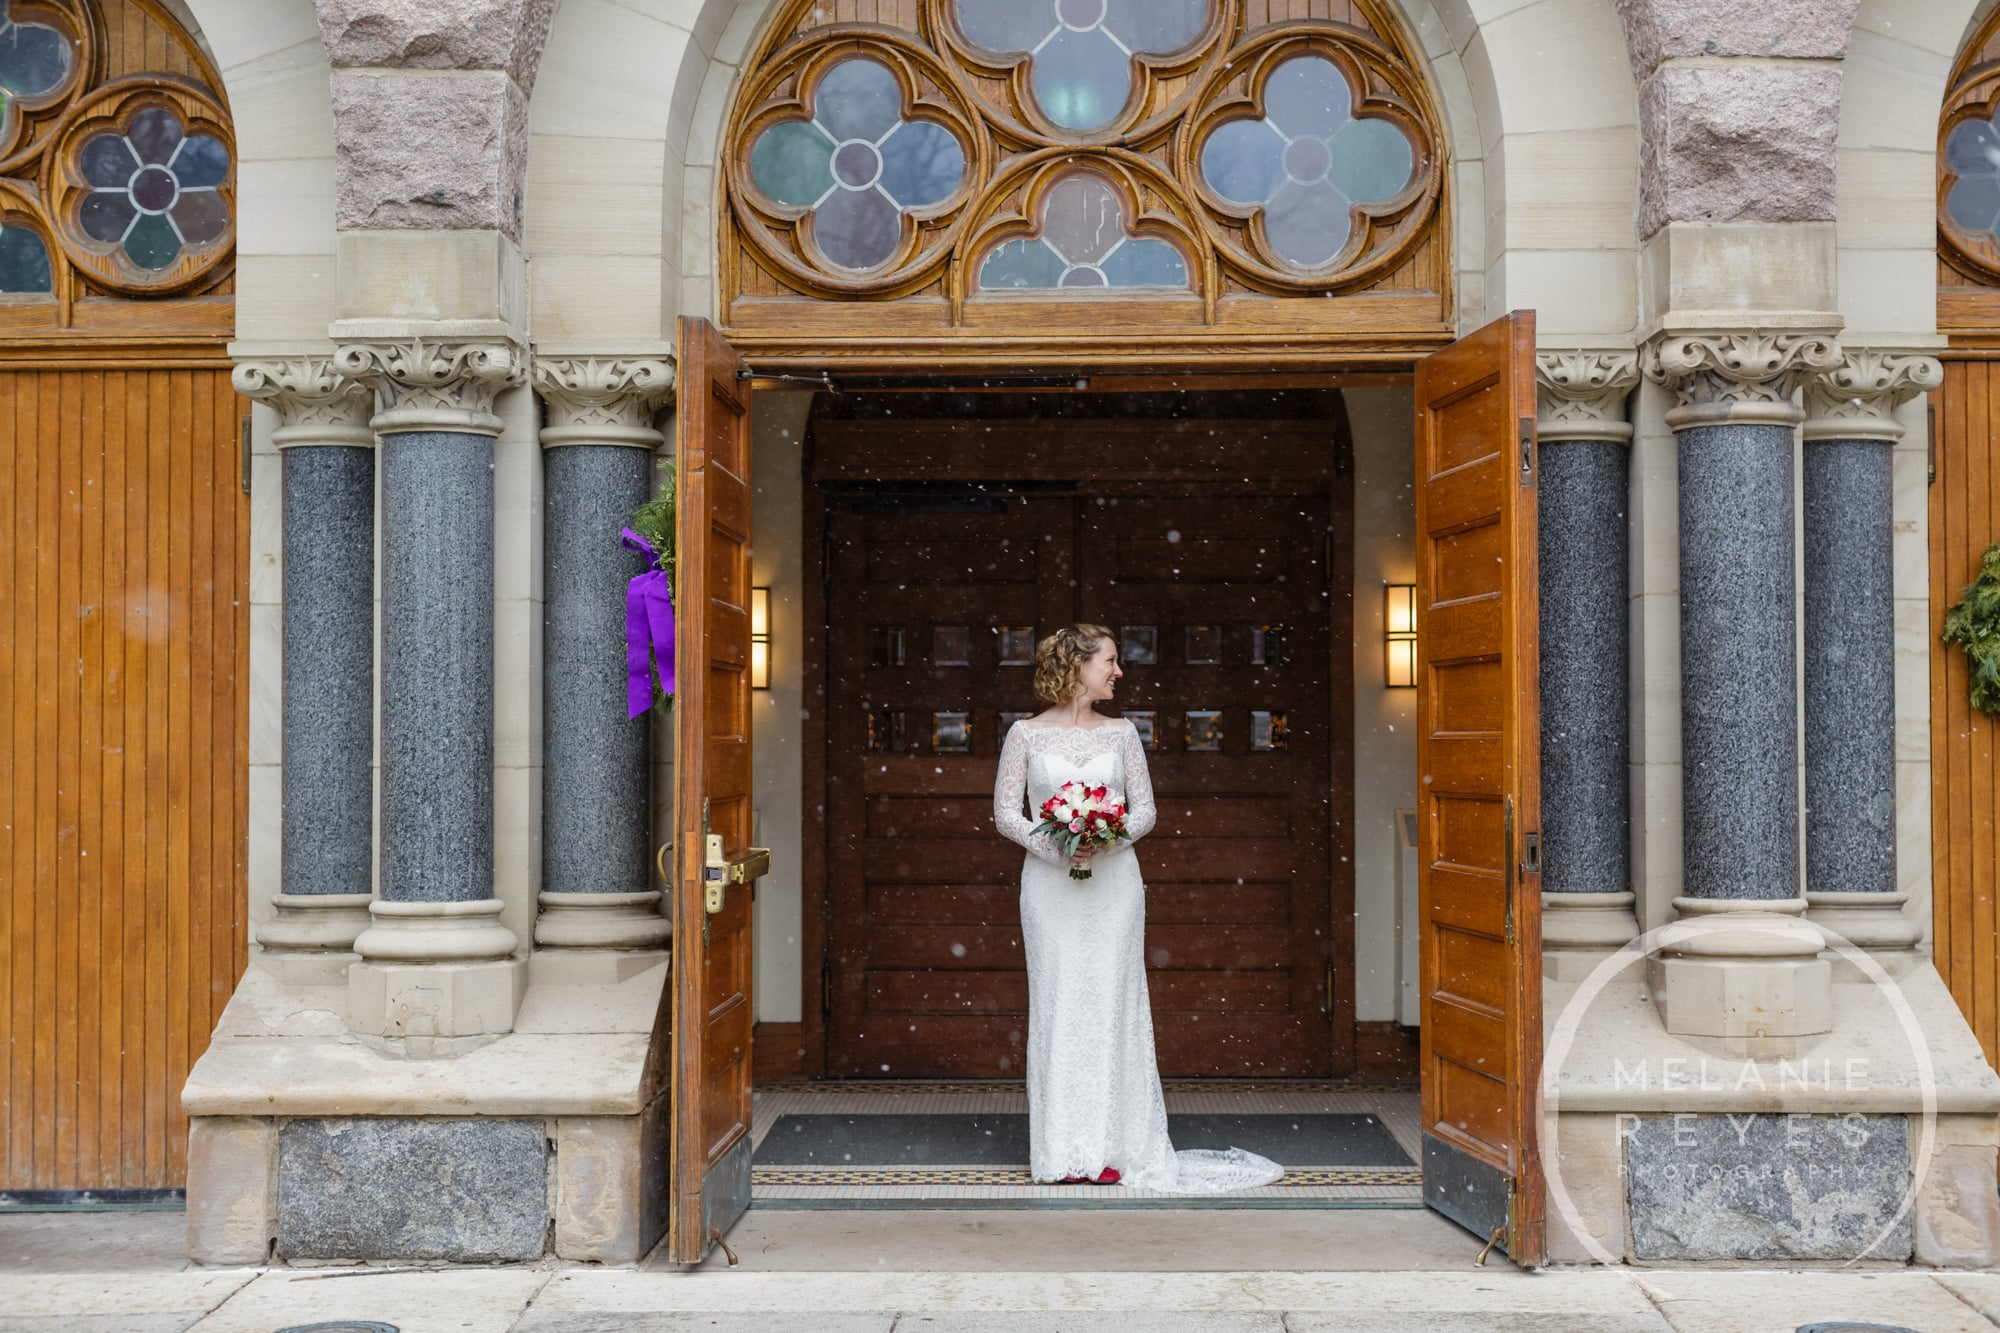 2015_ann_arbor_wedding_photographer_melaniereyes_015.JPG